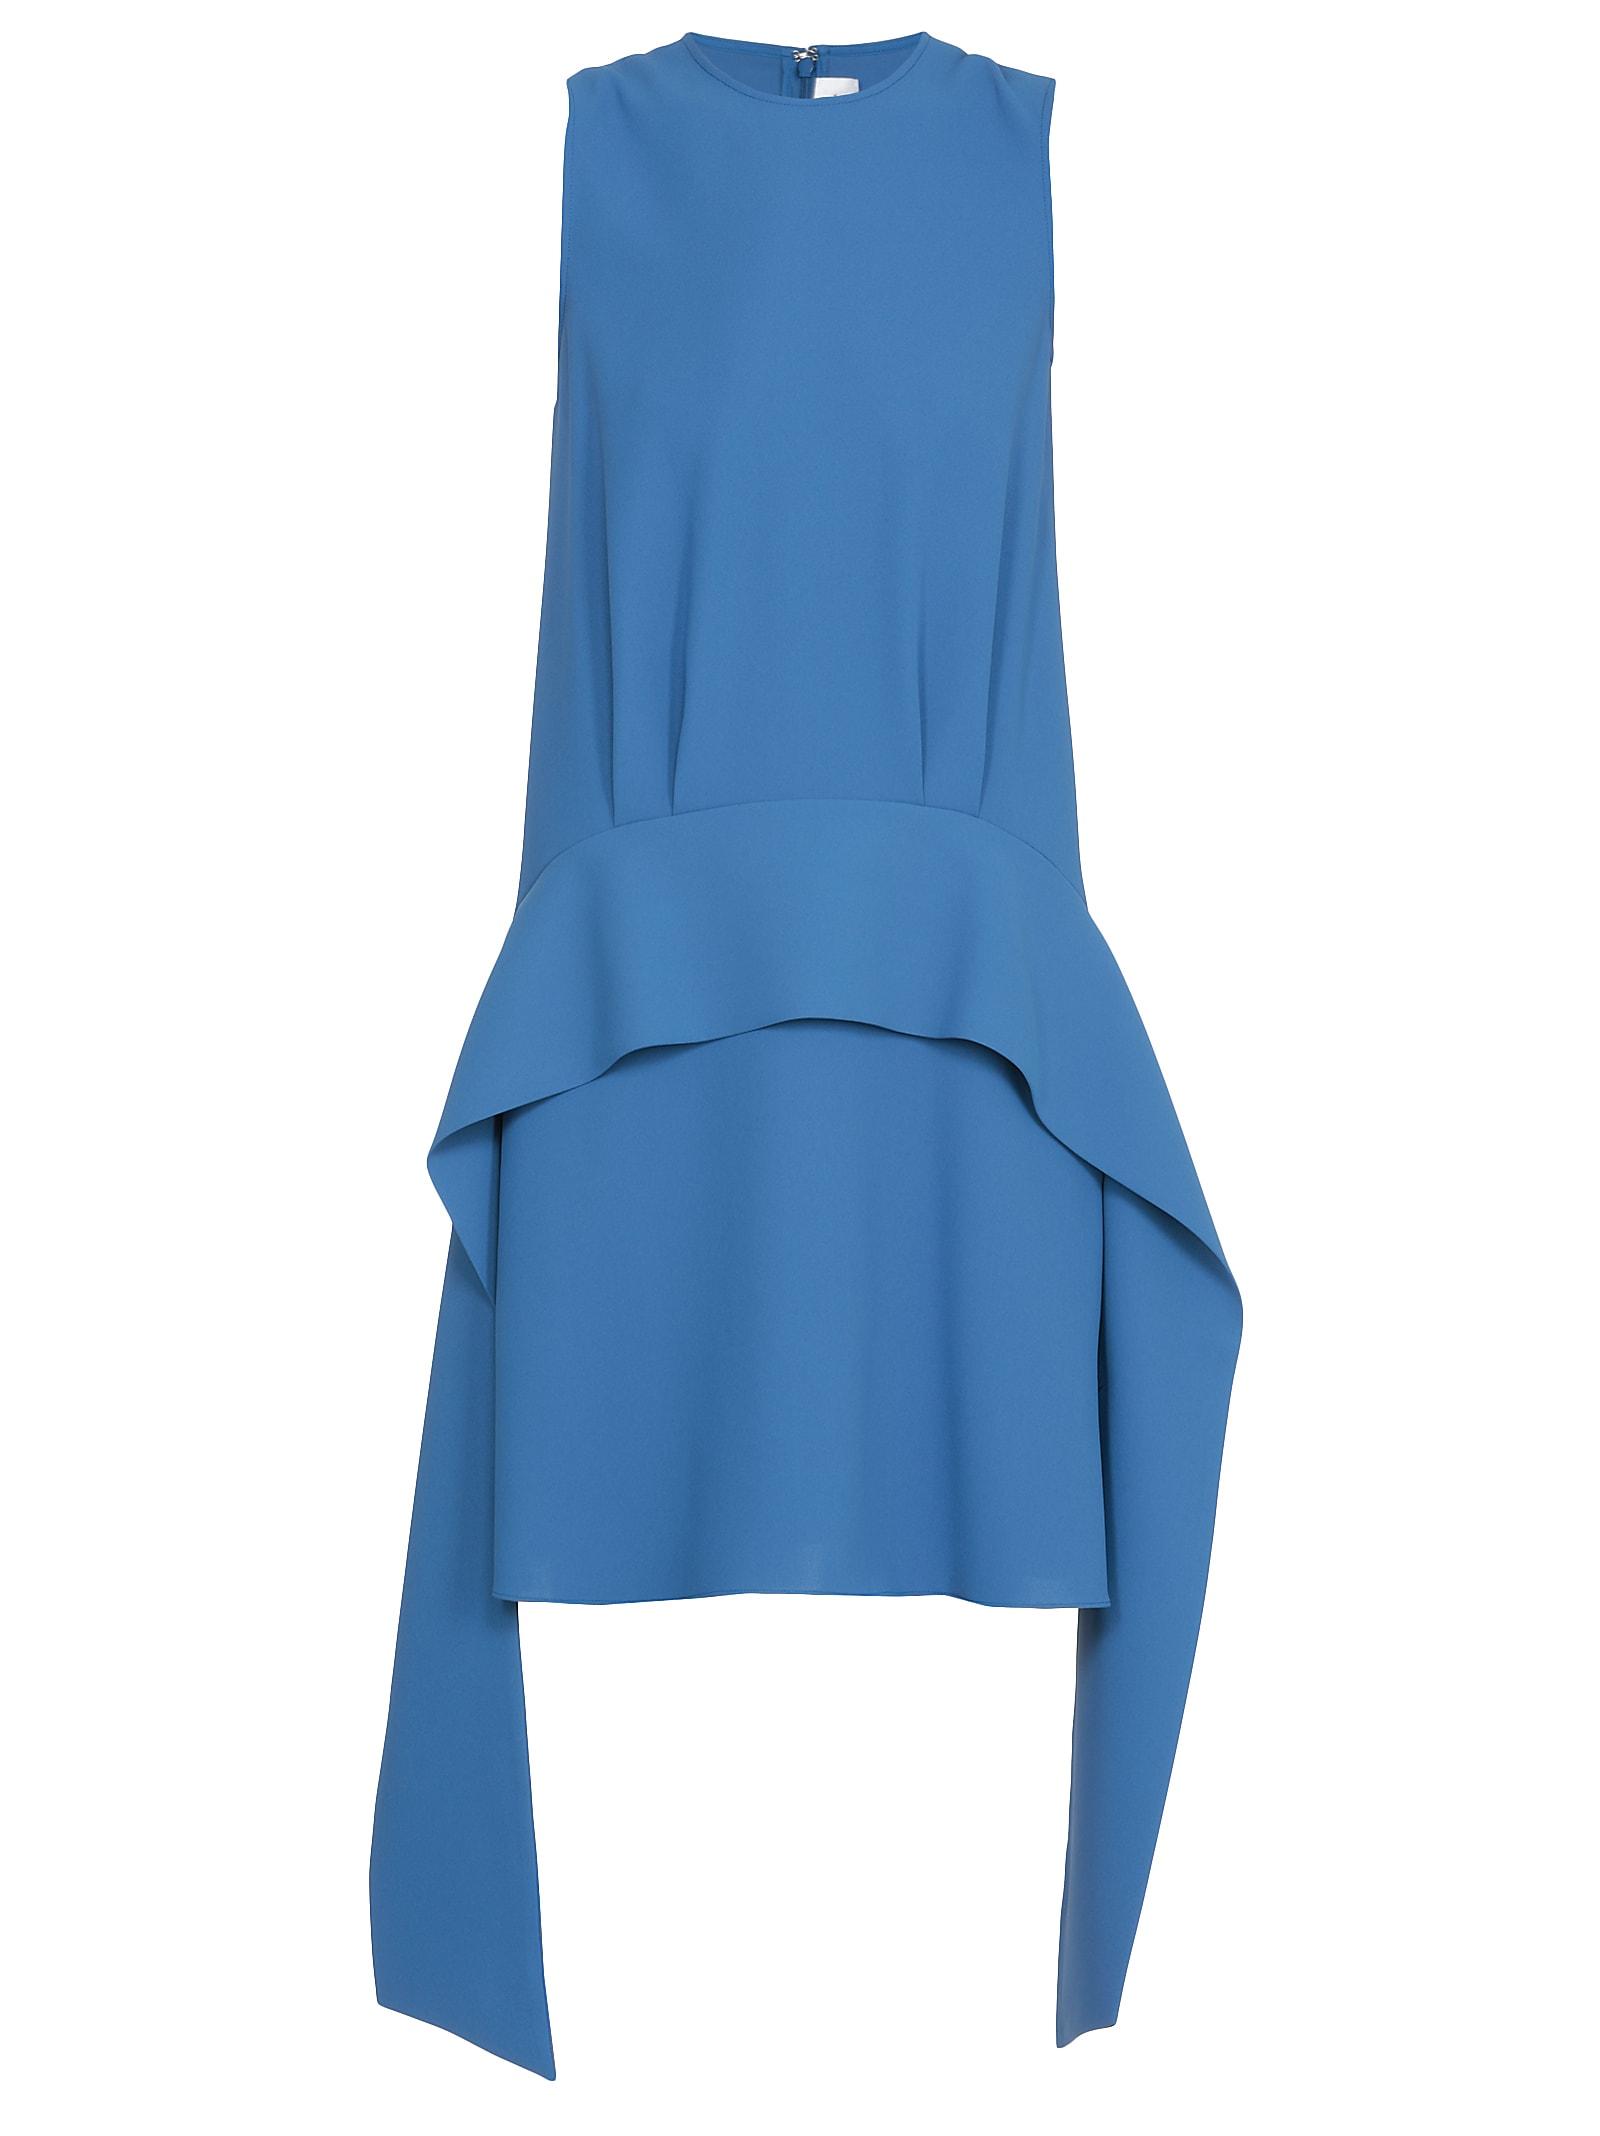 Buy Victoria Victoria Beckham Dress With Bend online, shop Victoria Victoria Beckham with free shipping